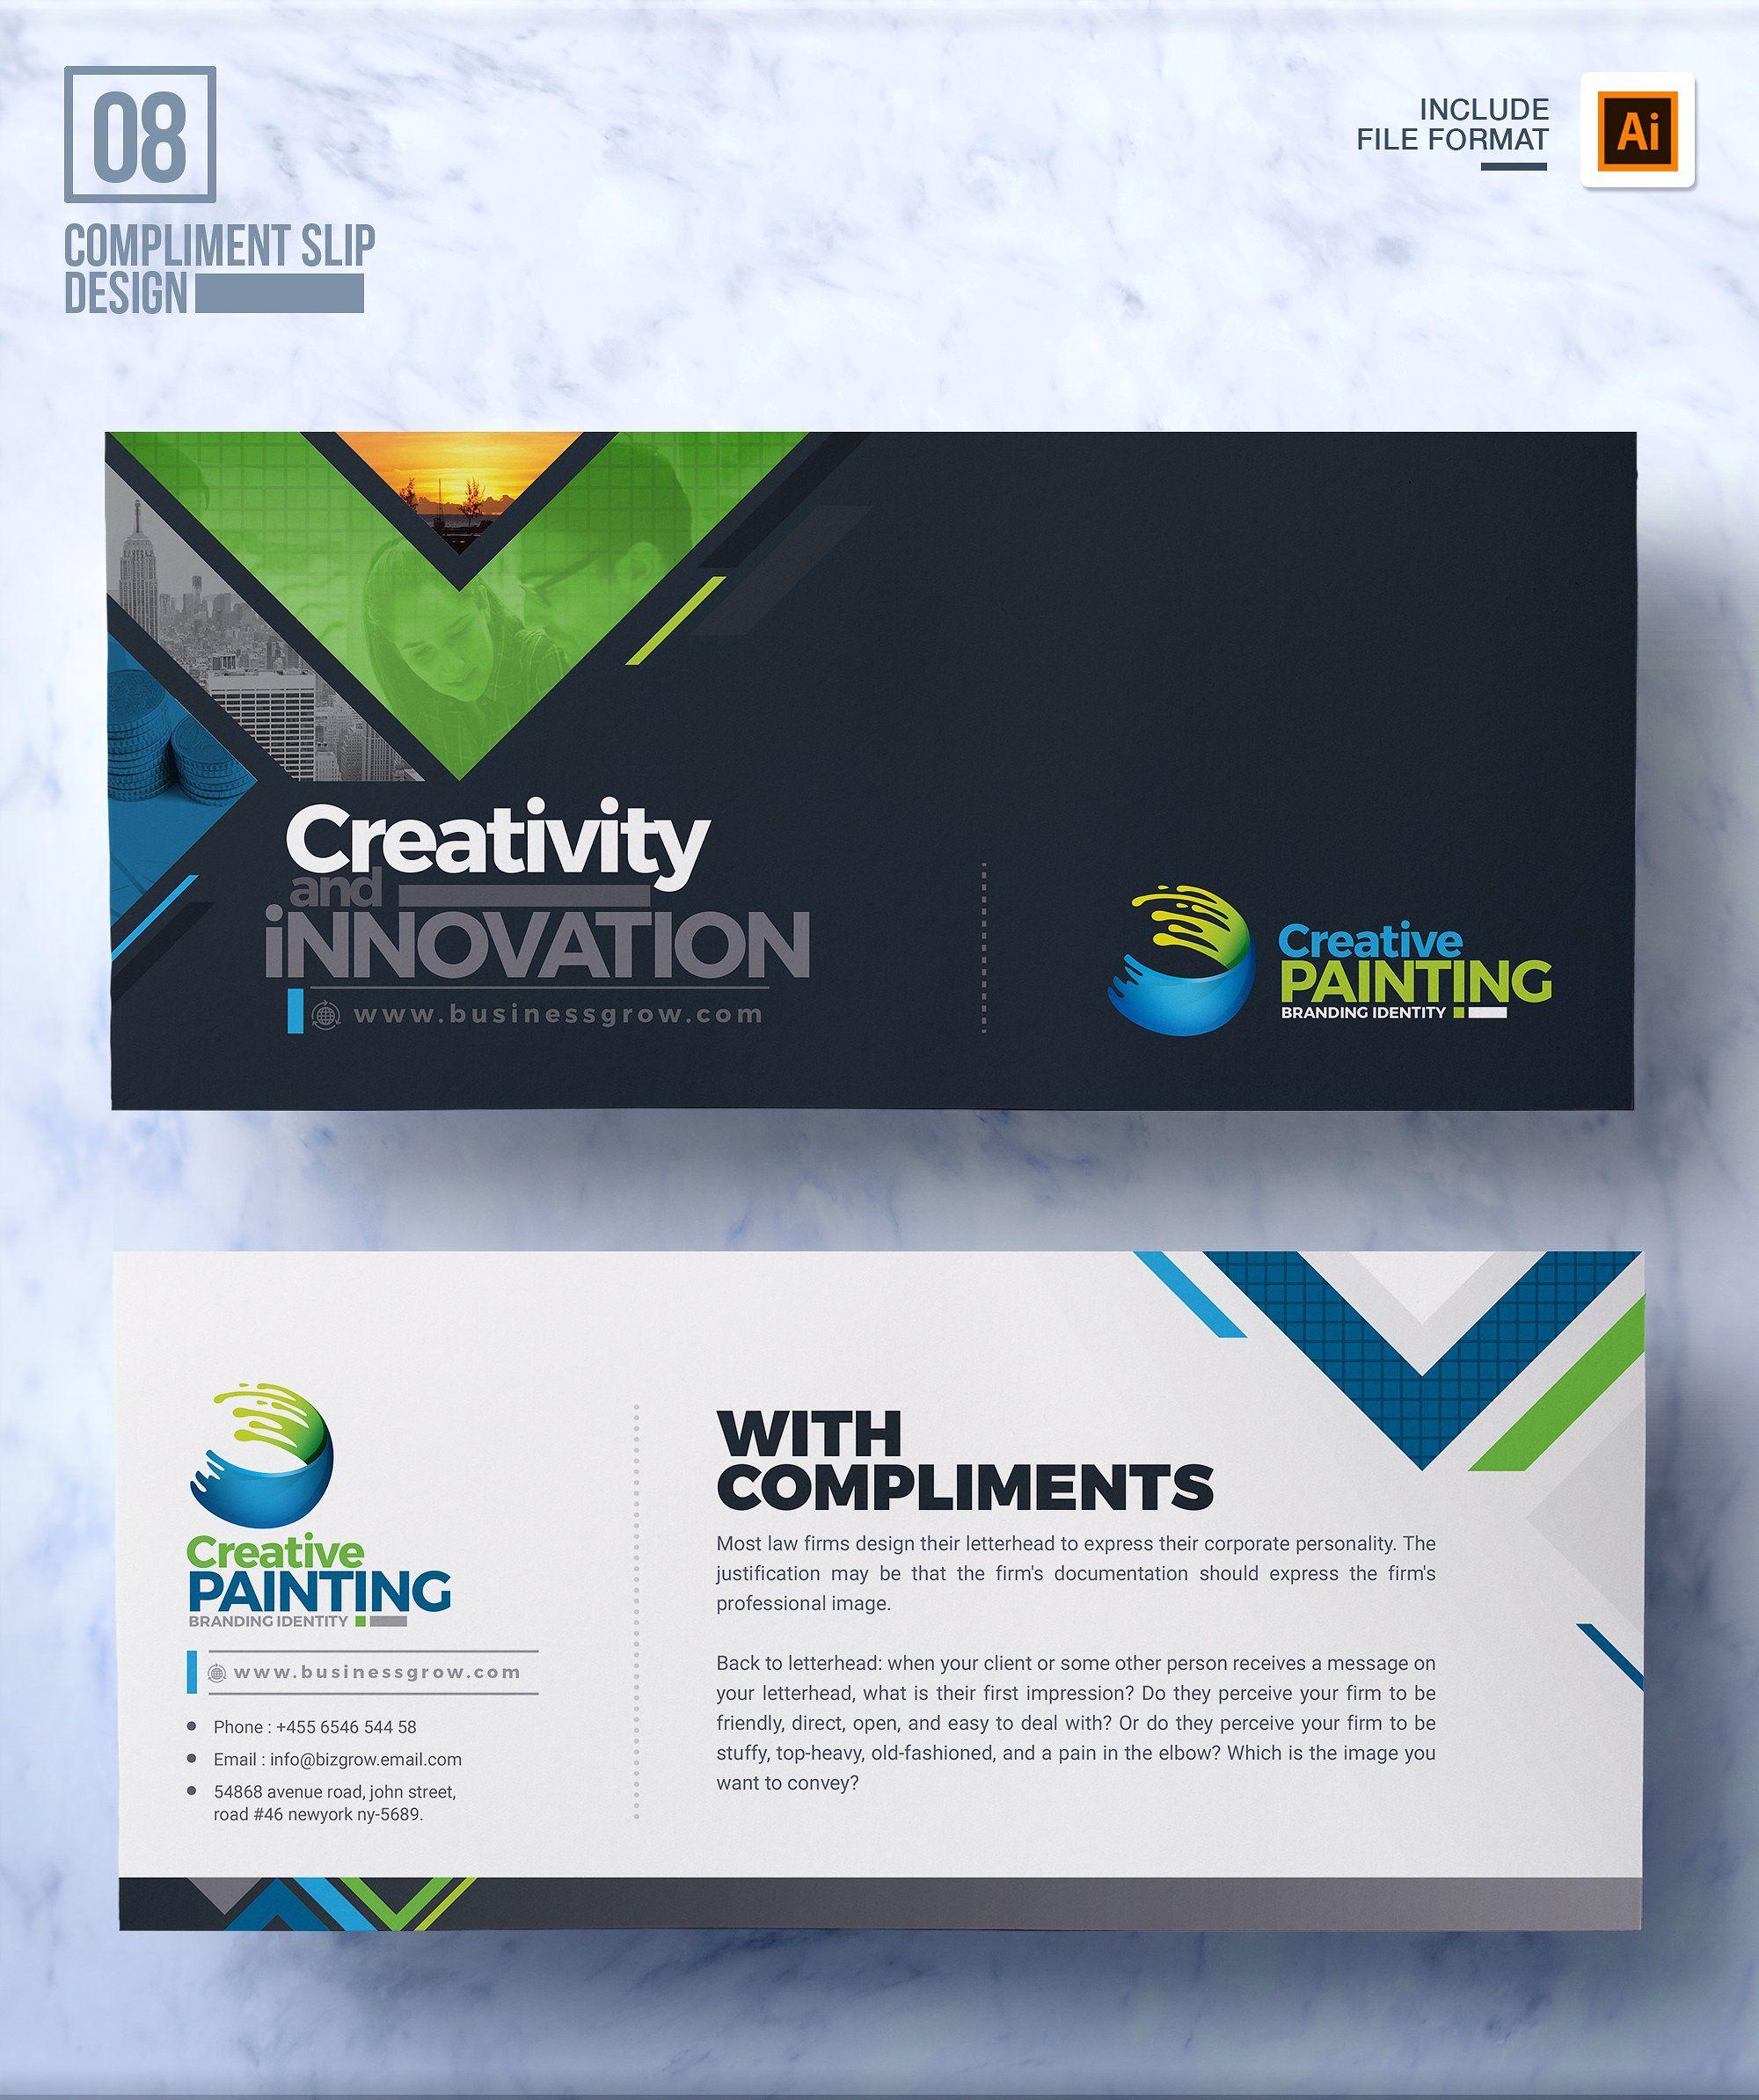 Business Mega Branding Bundle With Images Compliment Slip